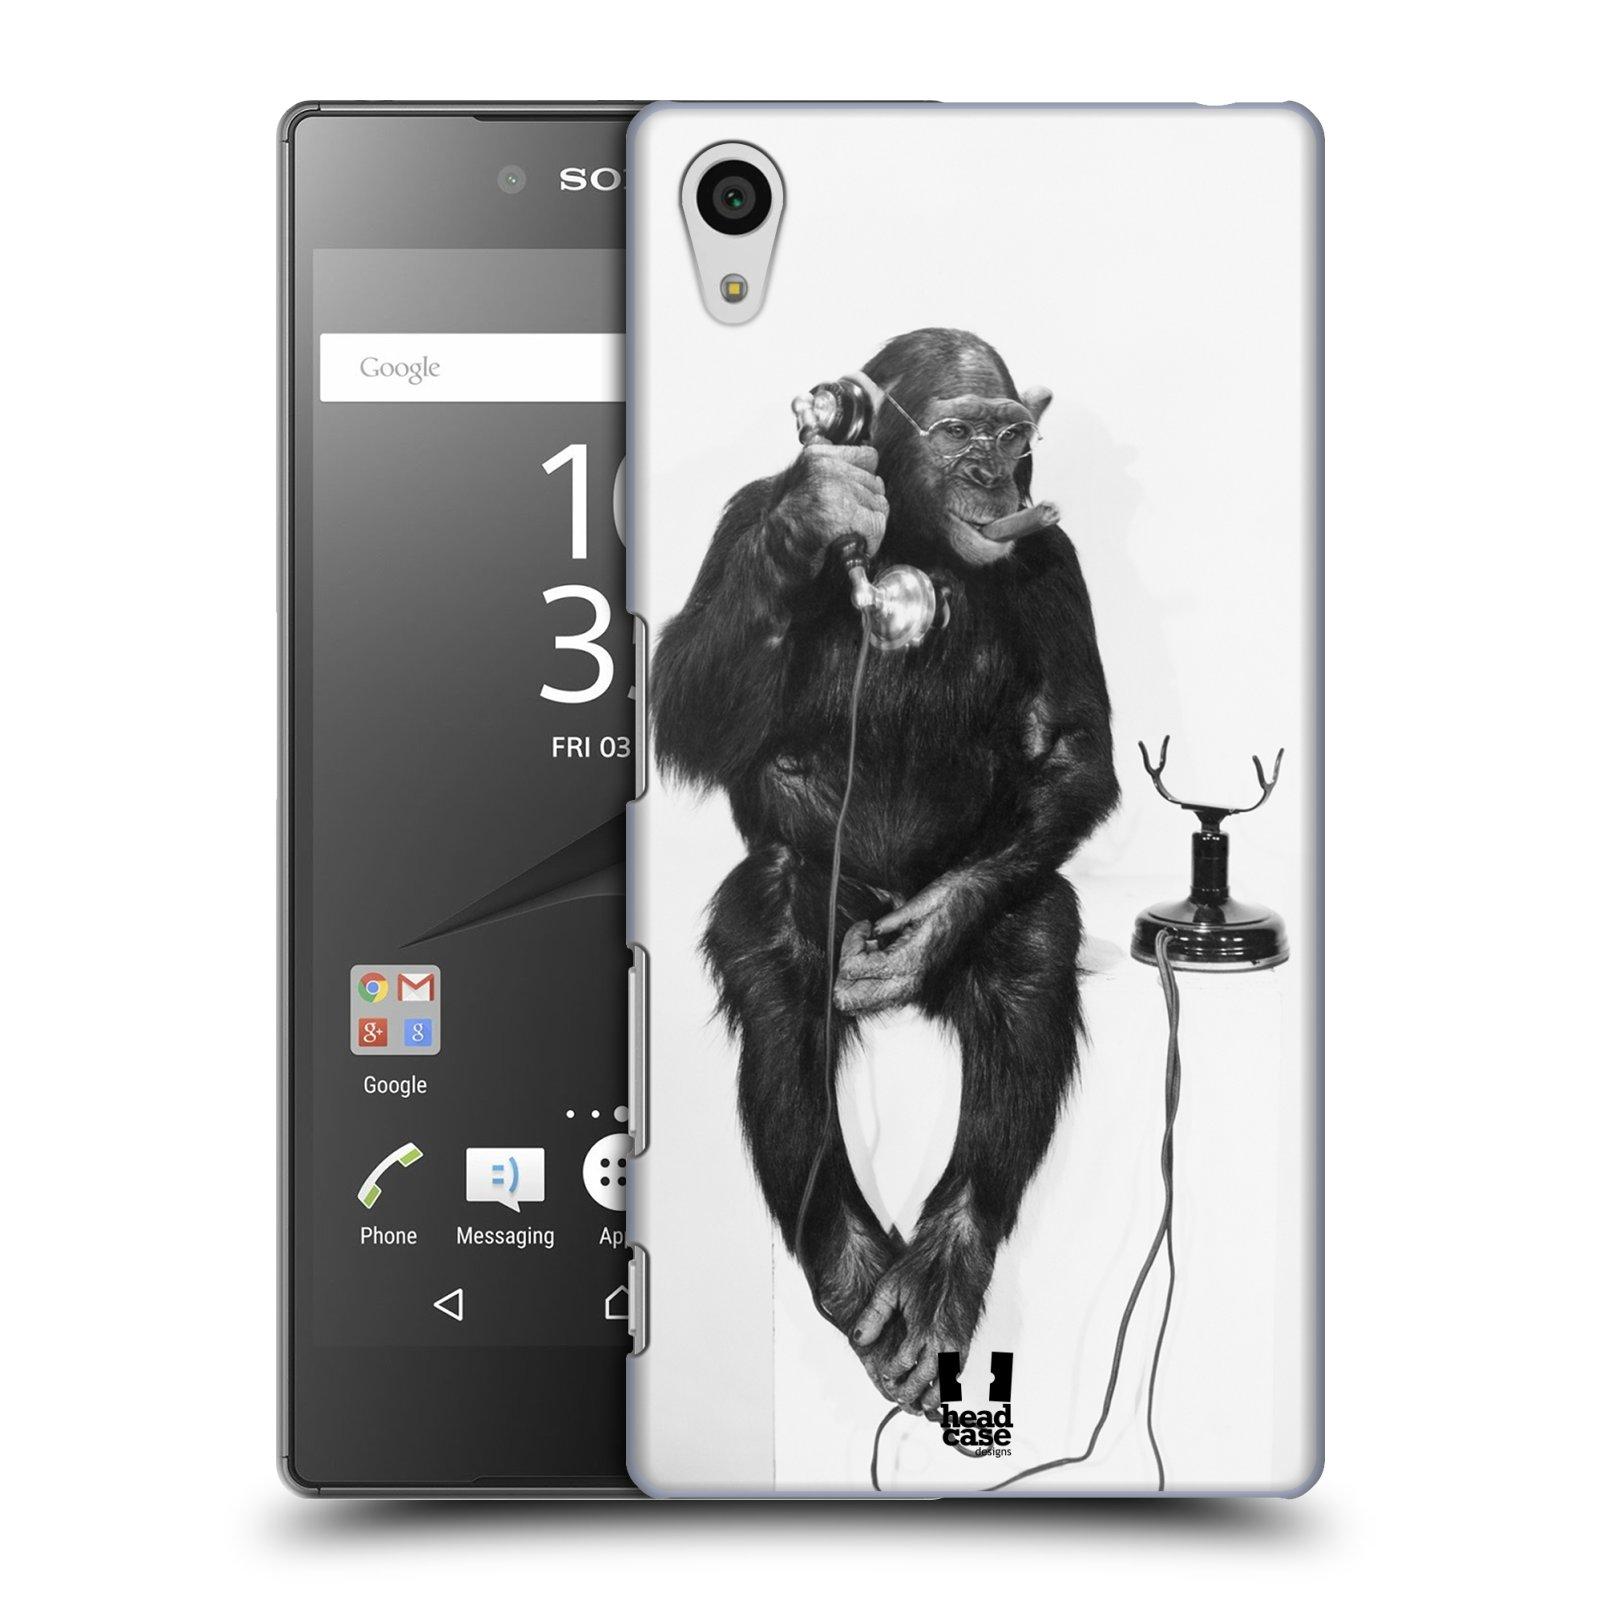 Plastové pouzdro na mobil Sony Xperia Z5 HEAD CASE OPIČÁK S TELEFONEM (Kryt či obal na mobilní telefon Sony Xperia Z5 E6653)